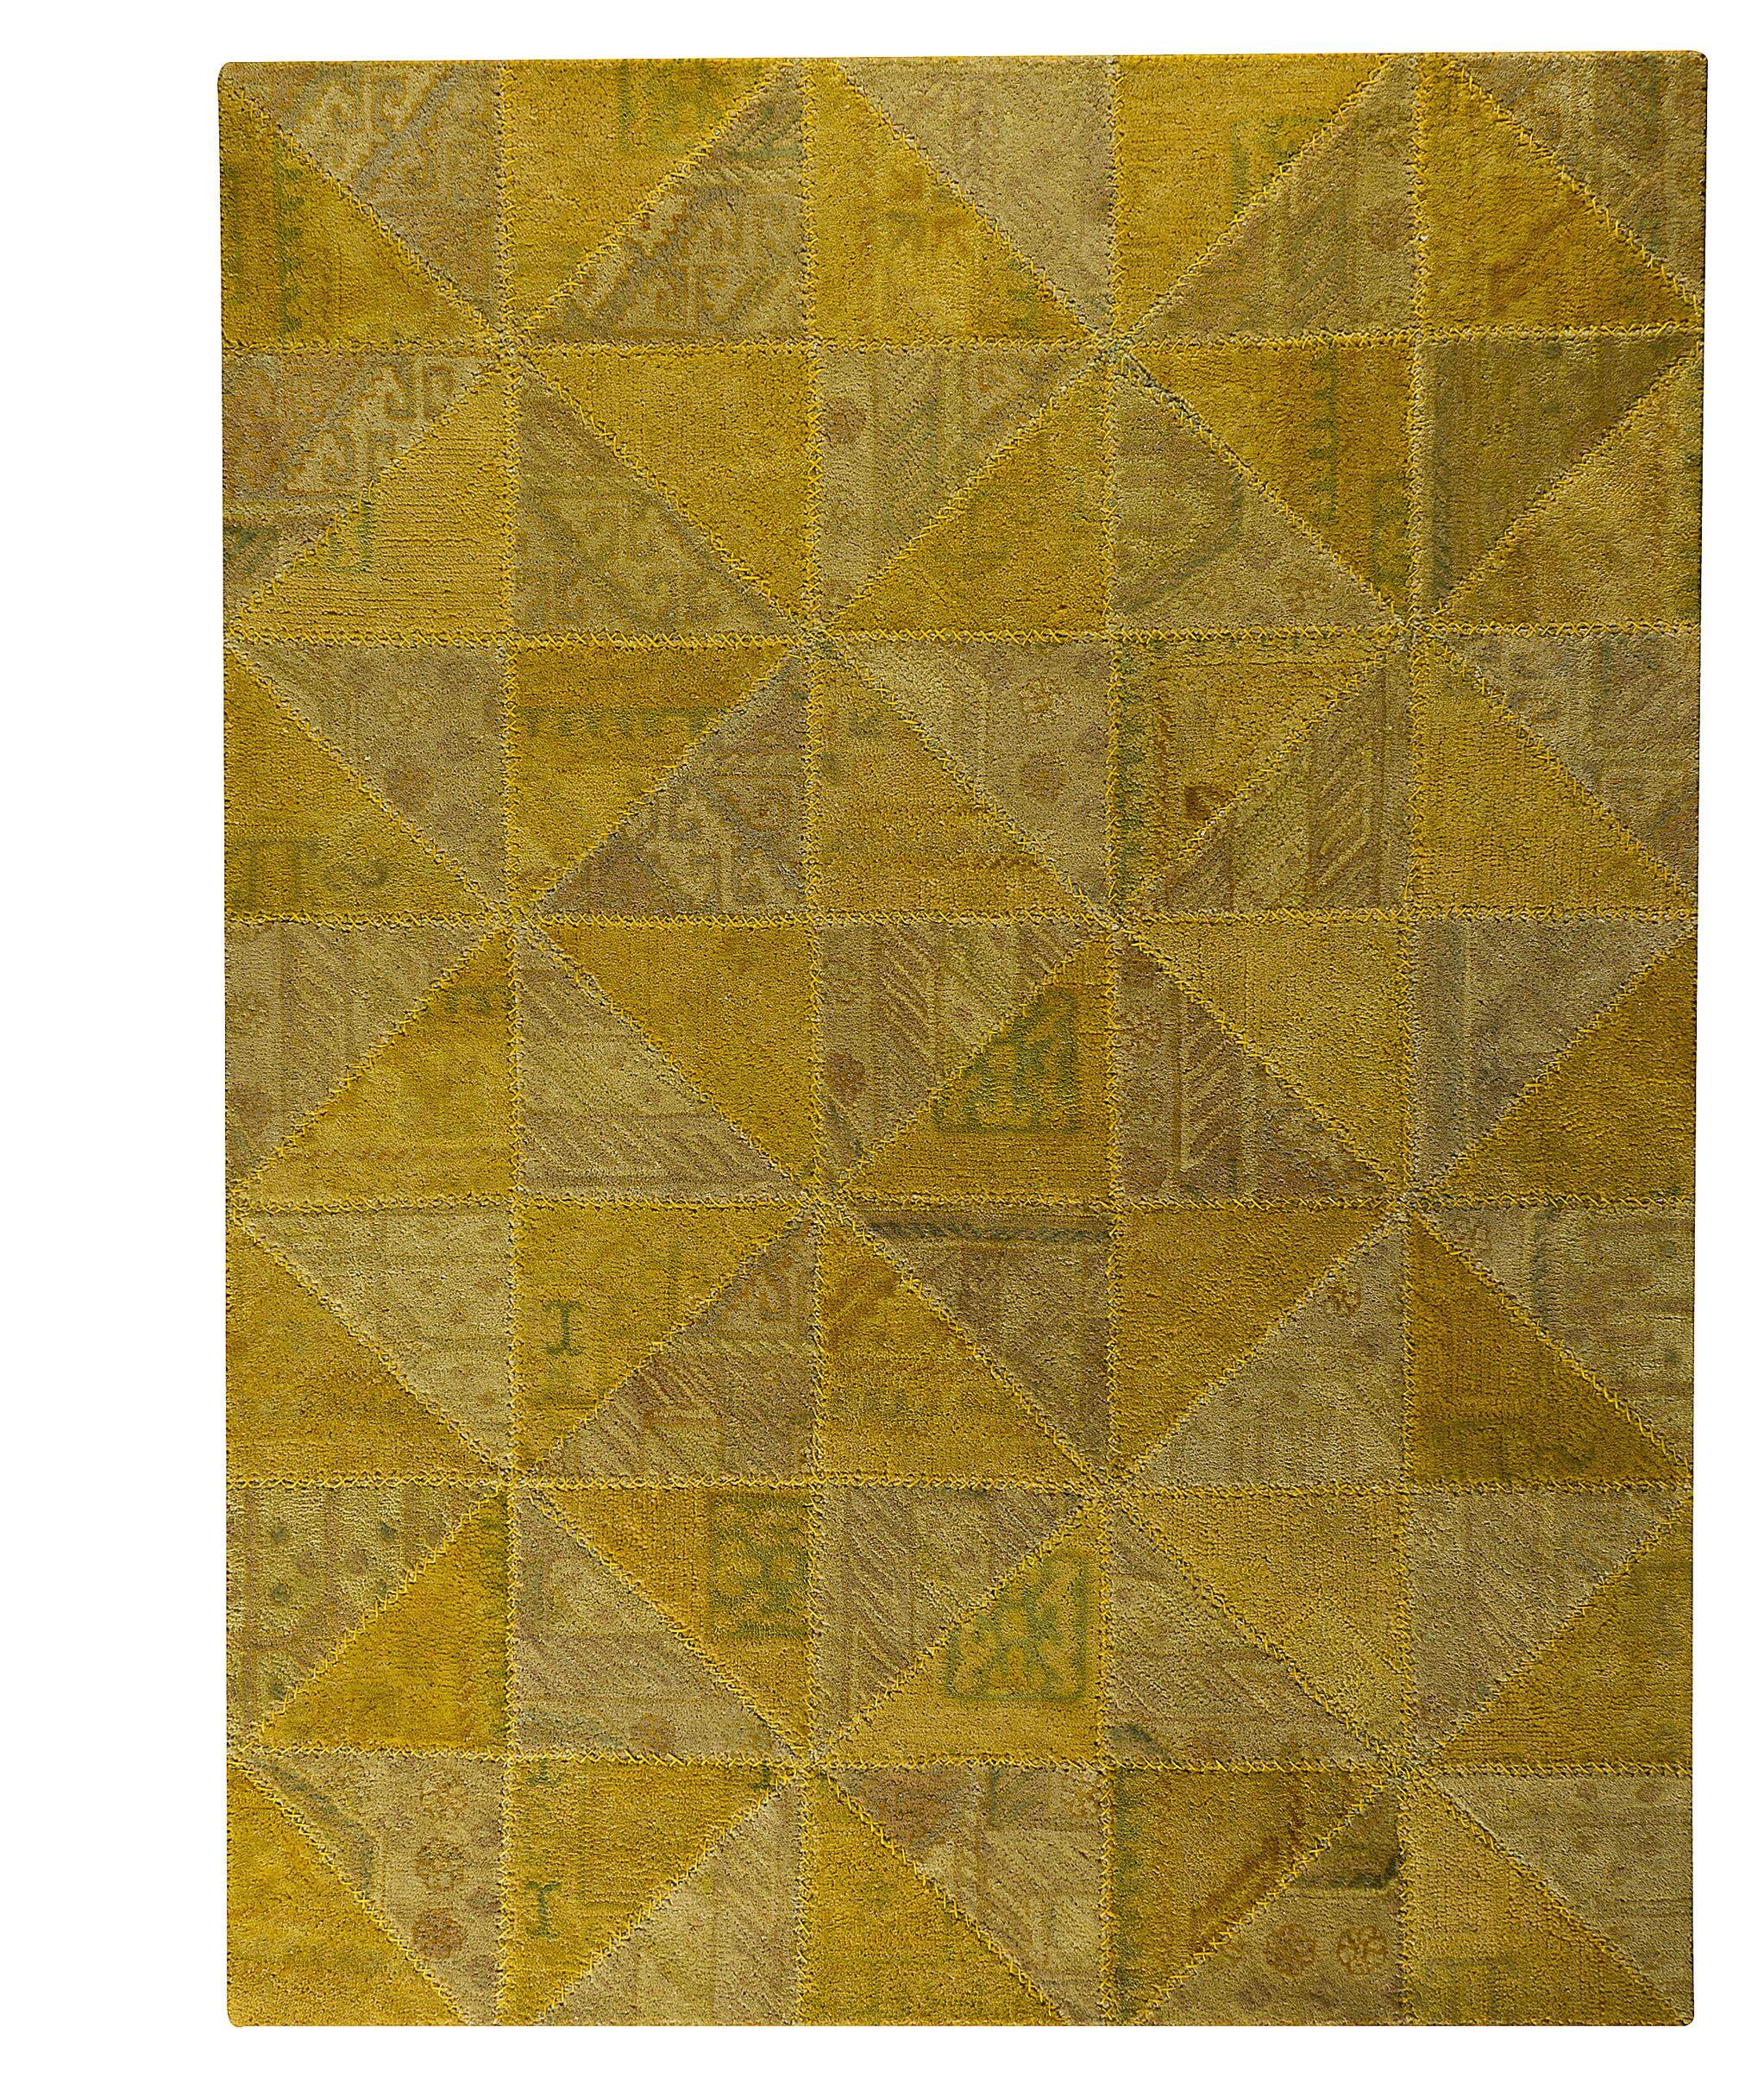 Acevedo Light Gold Area Rug Rug Size: 5'2